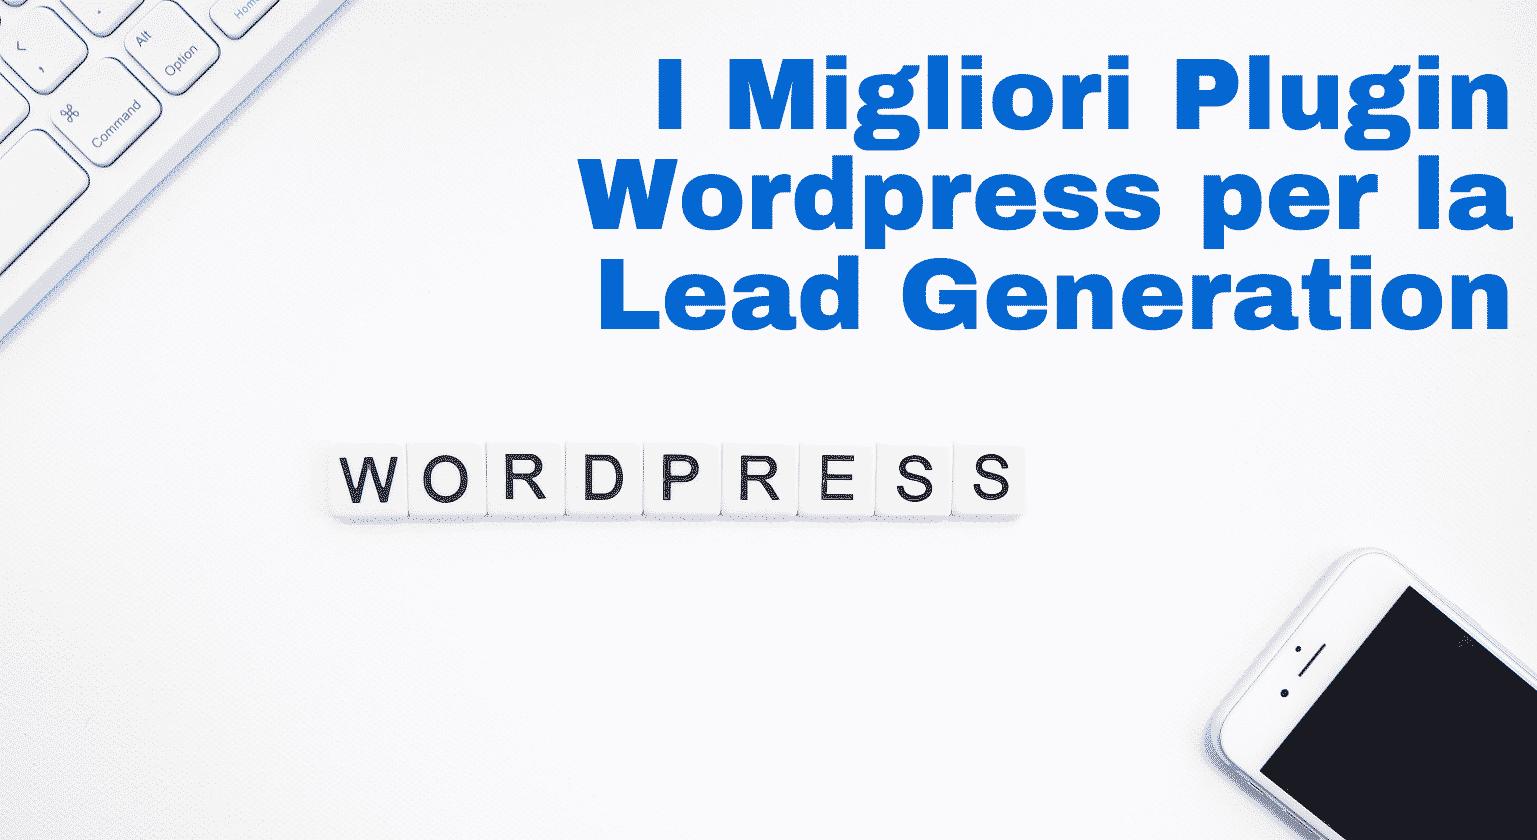 Migliori plugin wordpress per lead generation